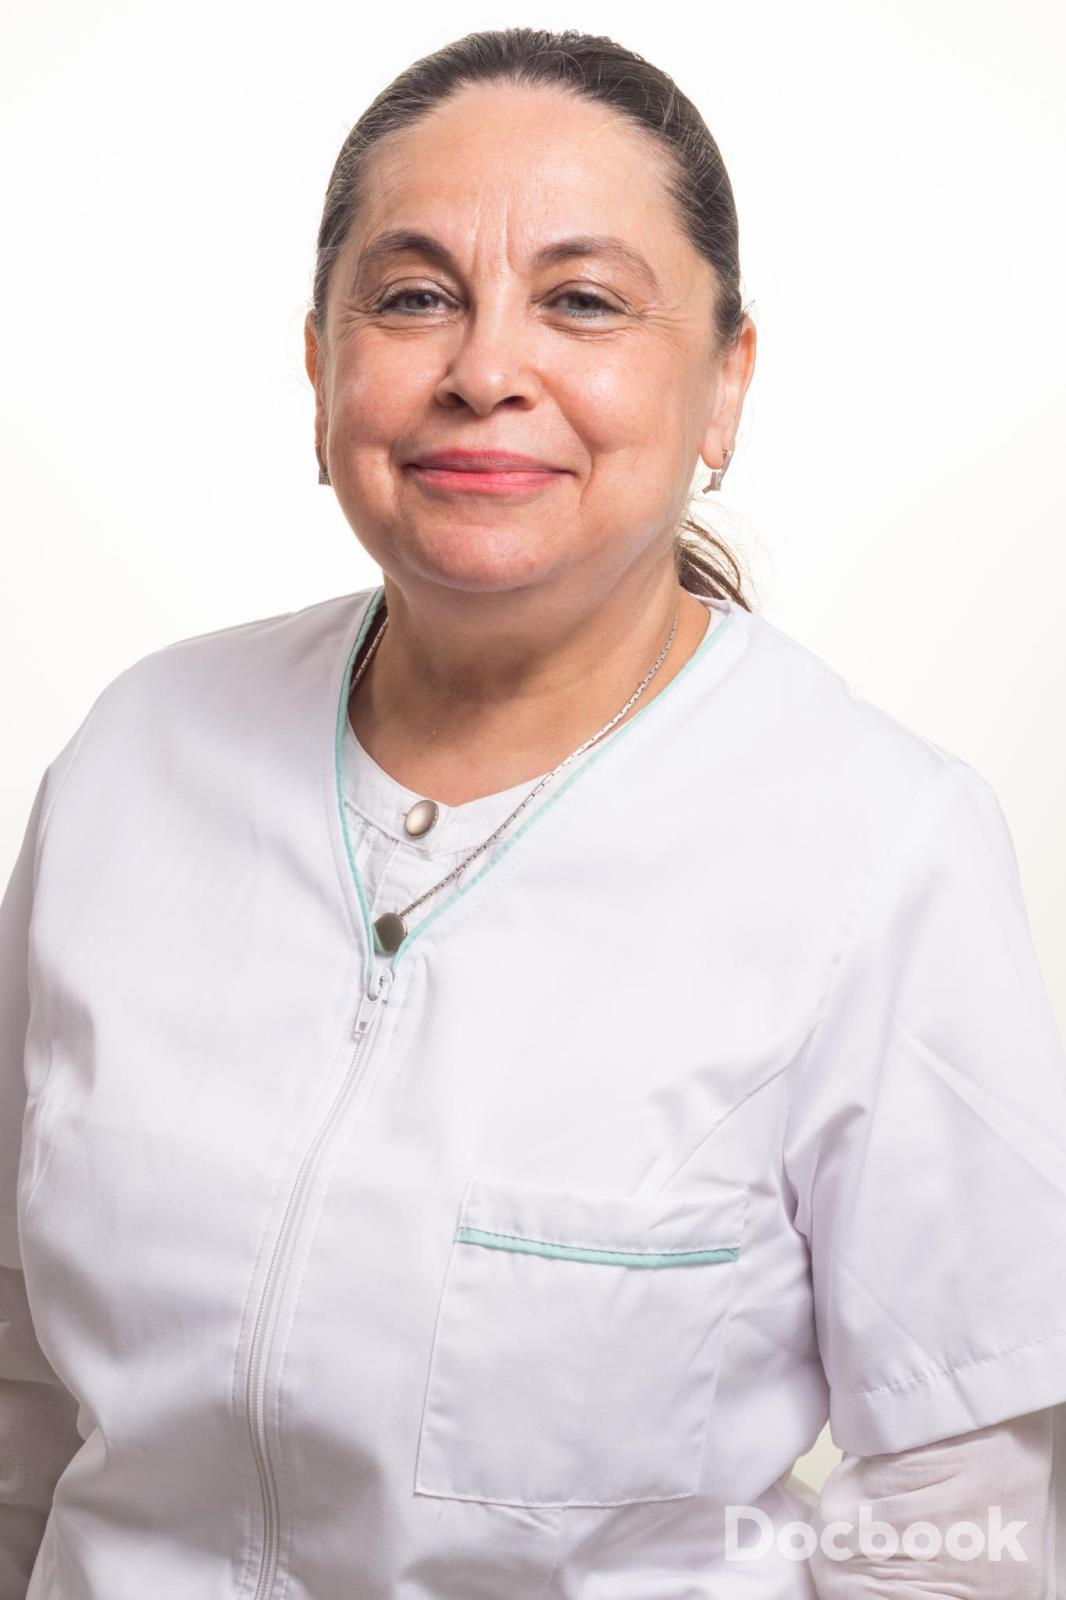 Dr. Mihaela Ciolac